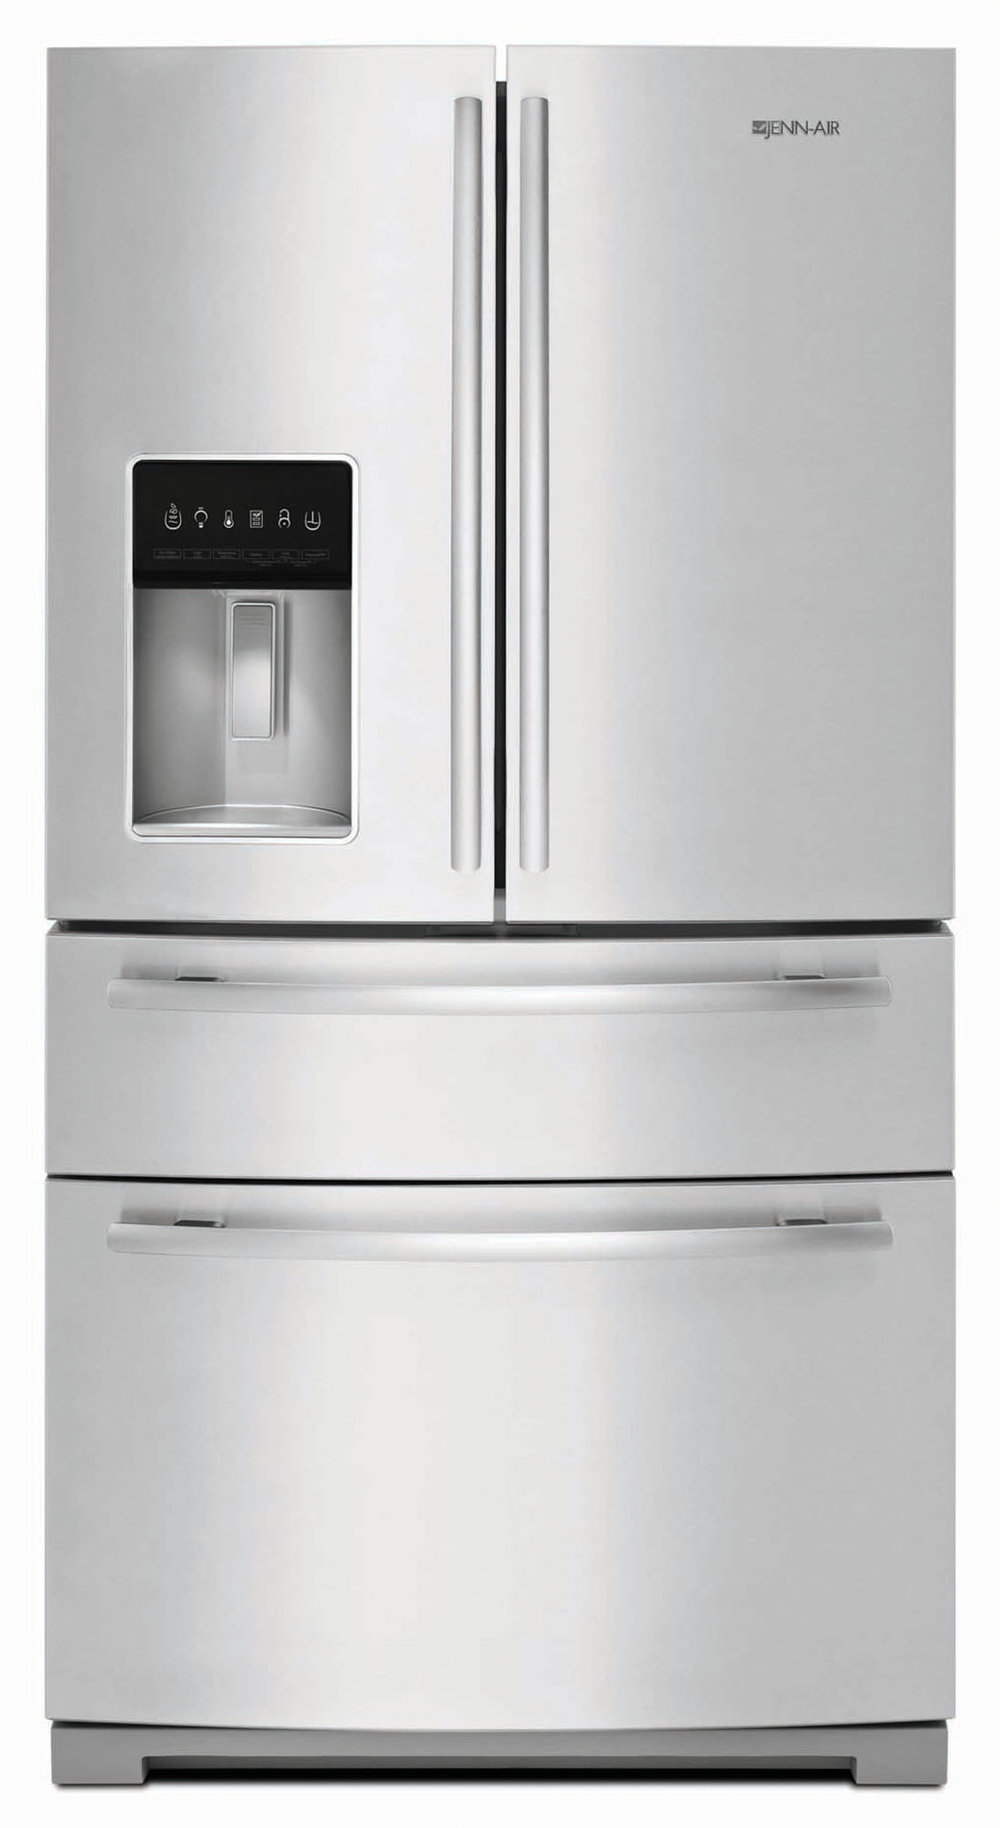 "Jenn-Air Jenn-Air 69"" Standard-Depth French Door Refrigerator At Trail Appliances, (604) 278-6133, jennairblack.ca"